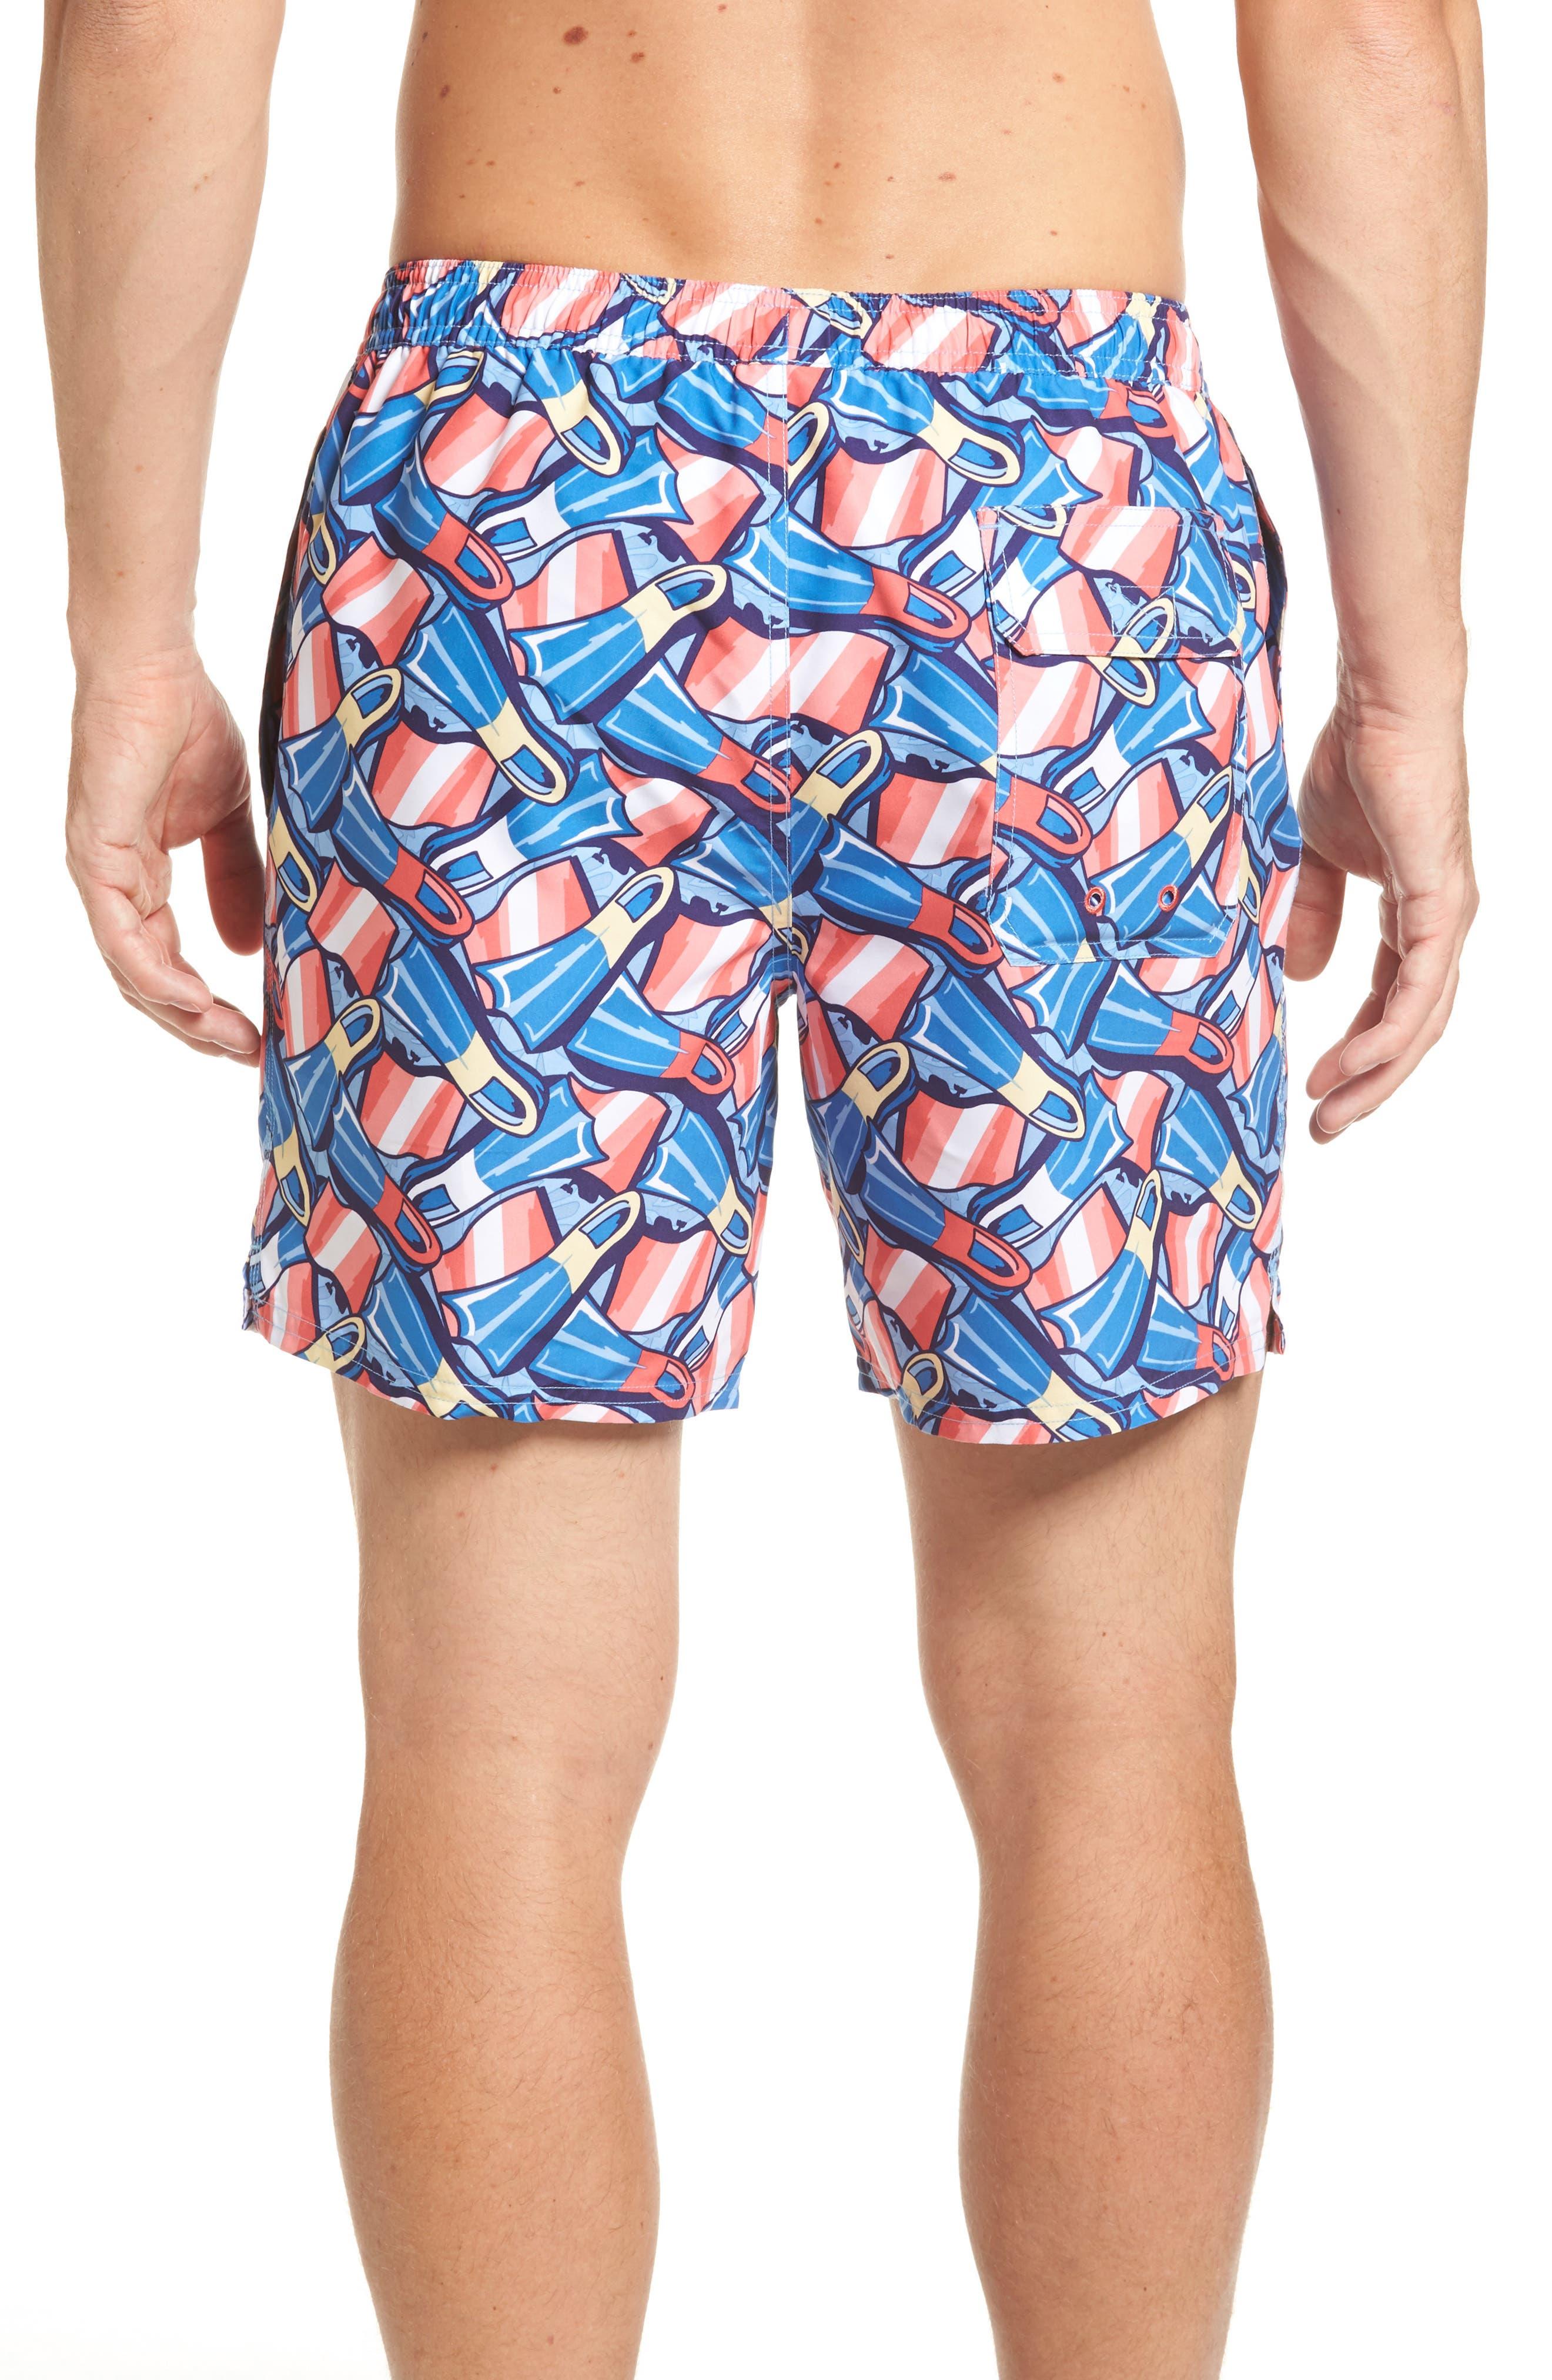 Flippers Chappy Swim Trunks,                             Alternate thumbnail 2, color,                             Dockside Blue